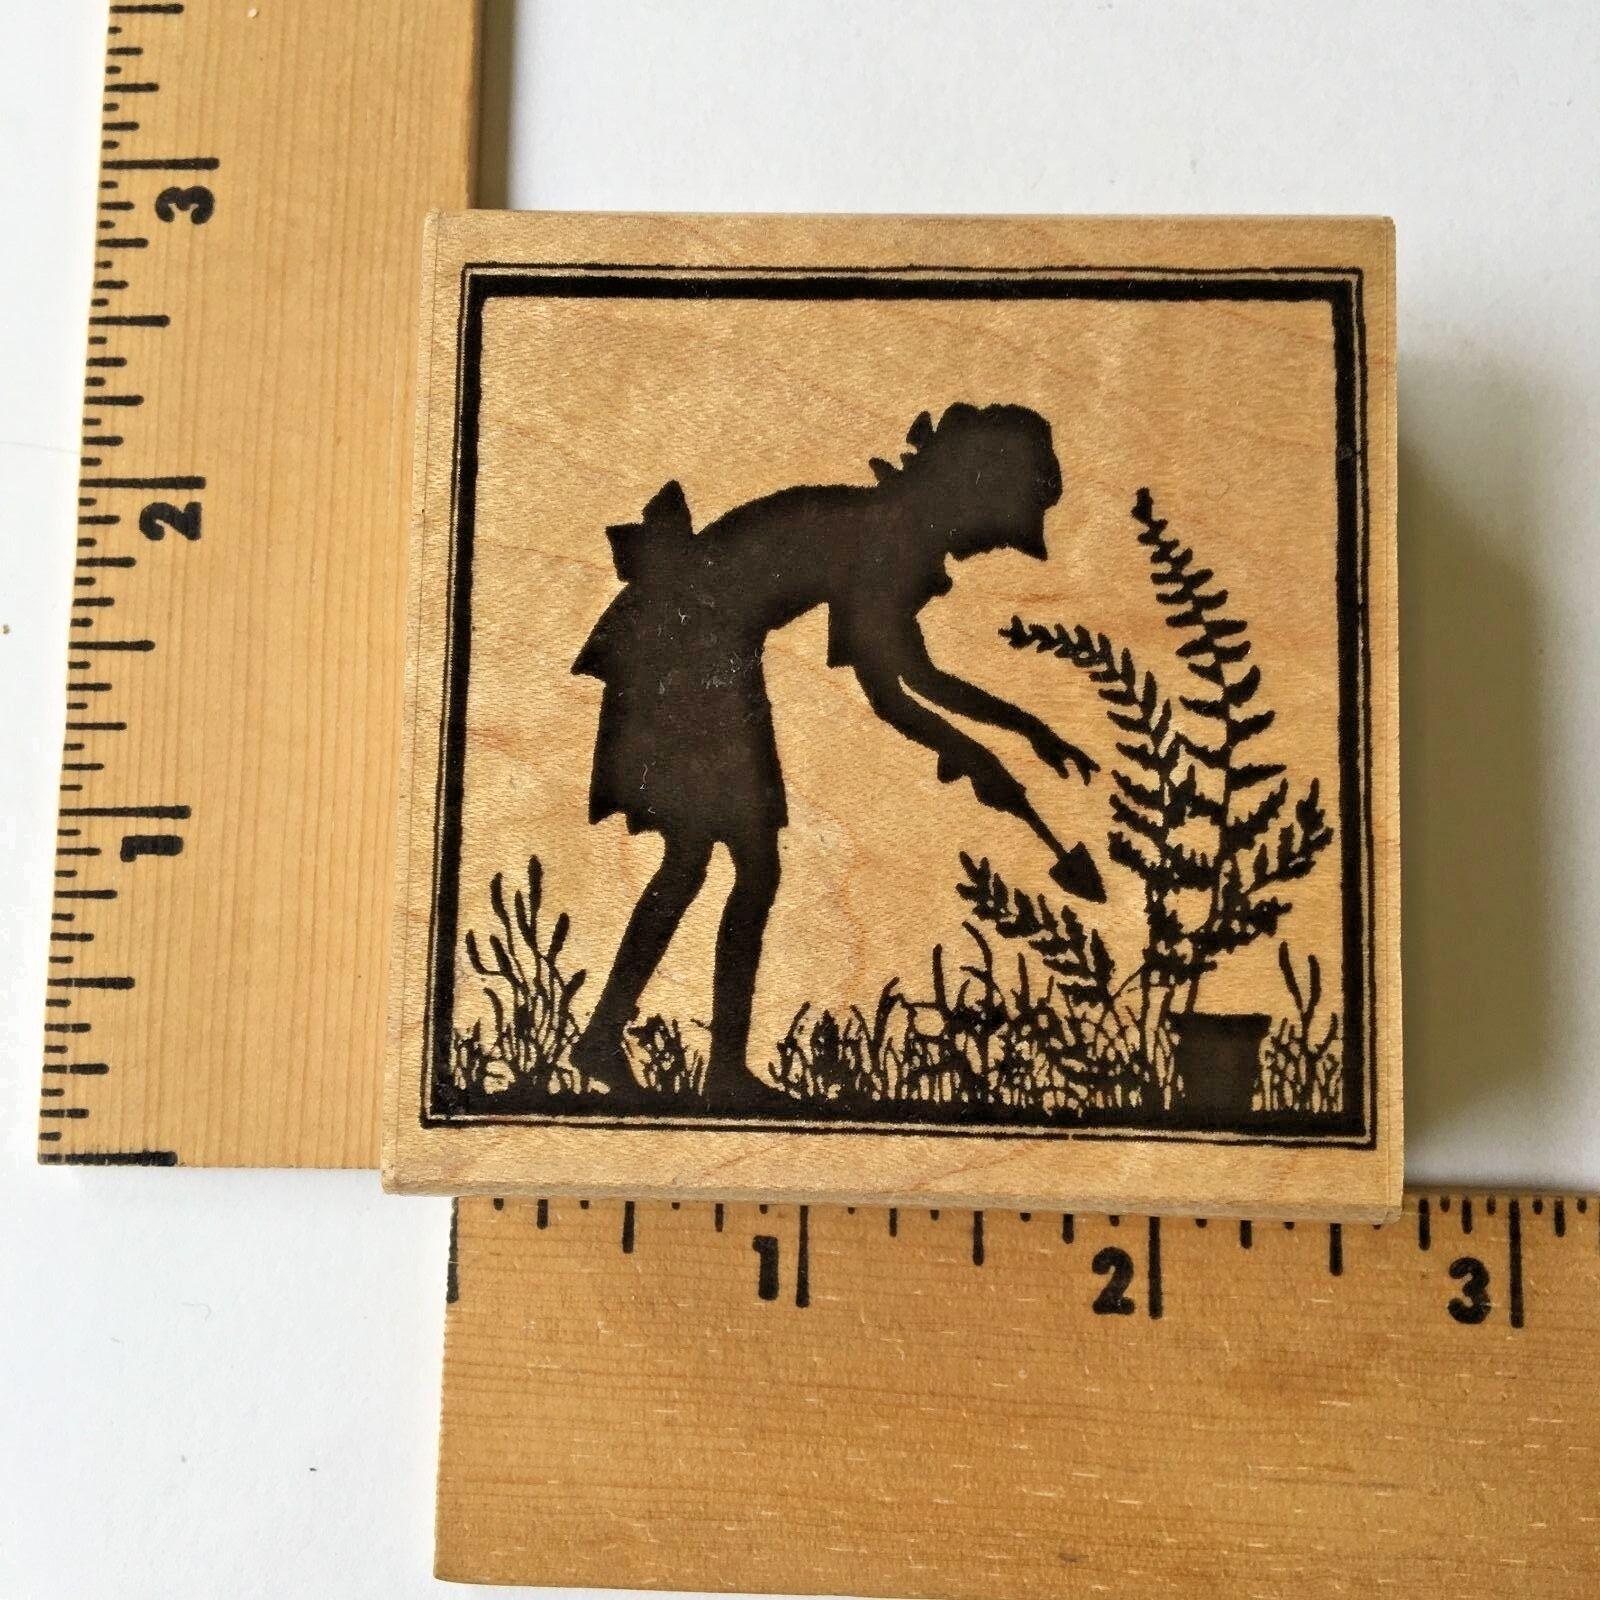 Garden Silhouette Rubber Stamp Set 00-600P6